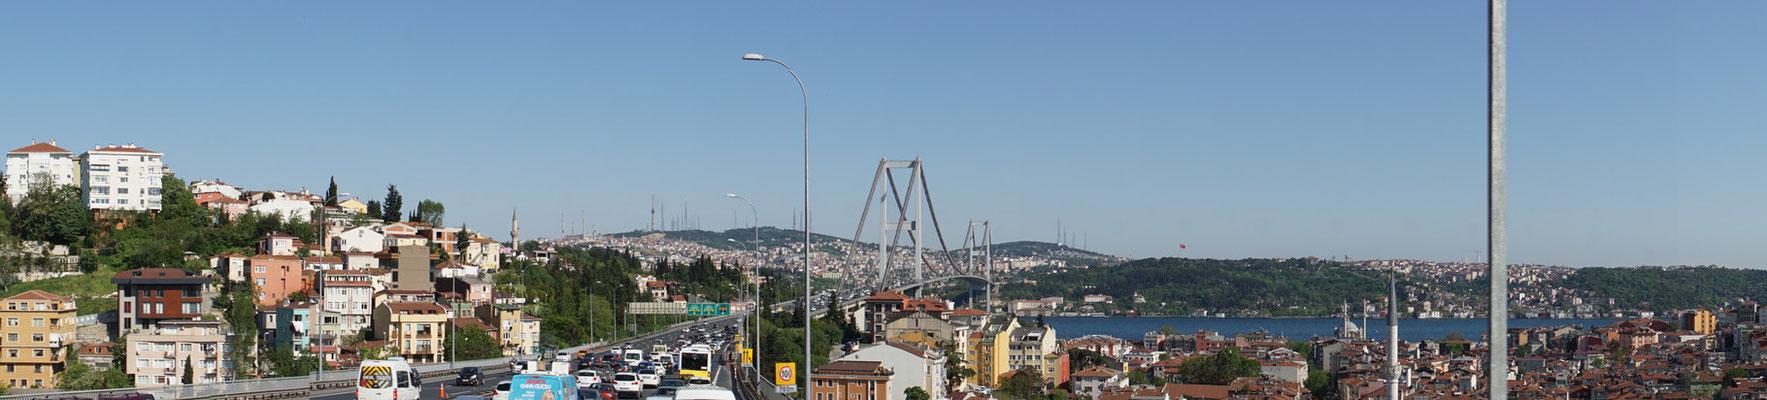 Panorama mit Brücke über den Bosphorus...